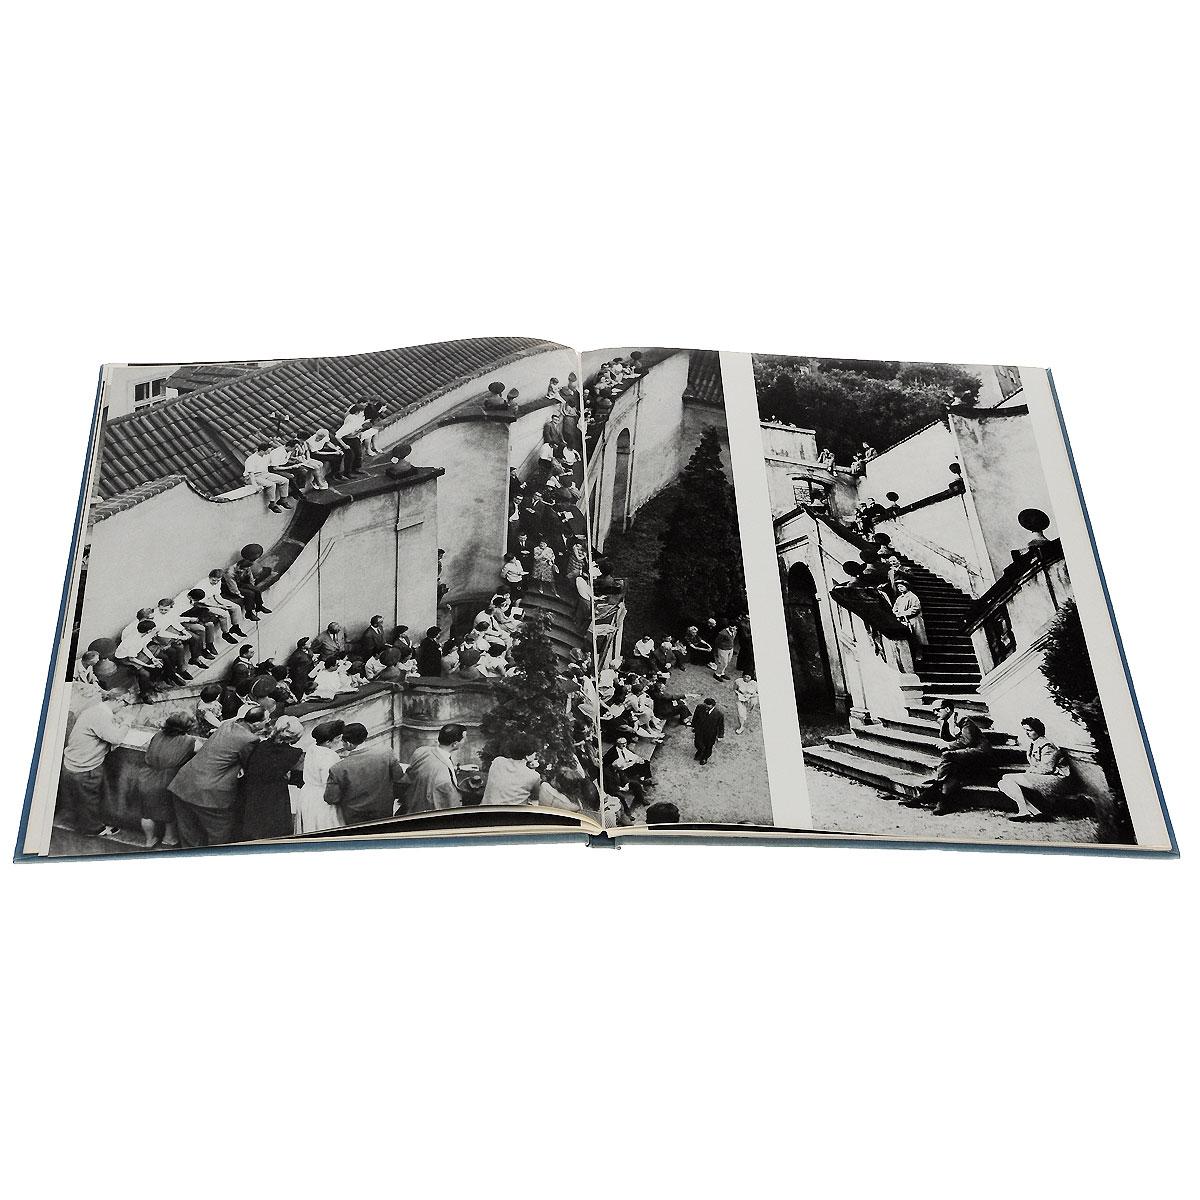 Prazske jaro ve fotografii / Printemps de Prague en photographie